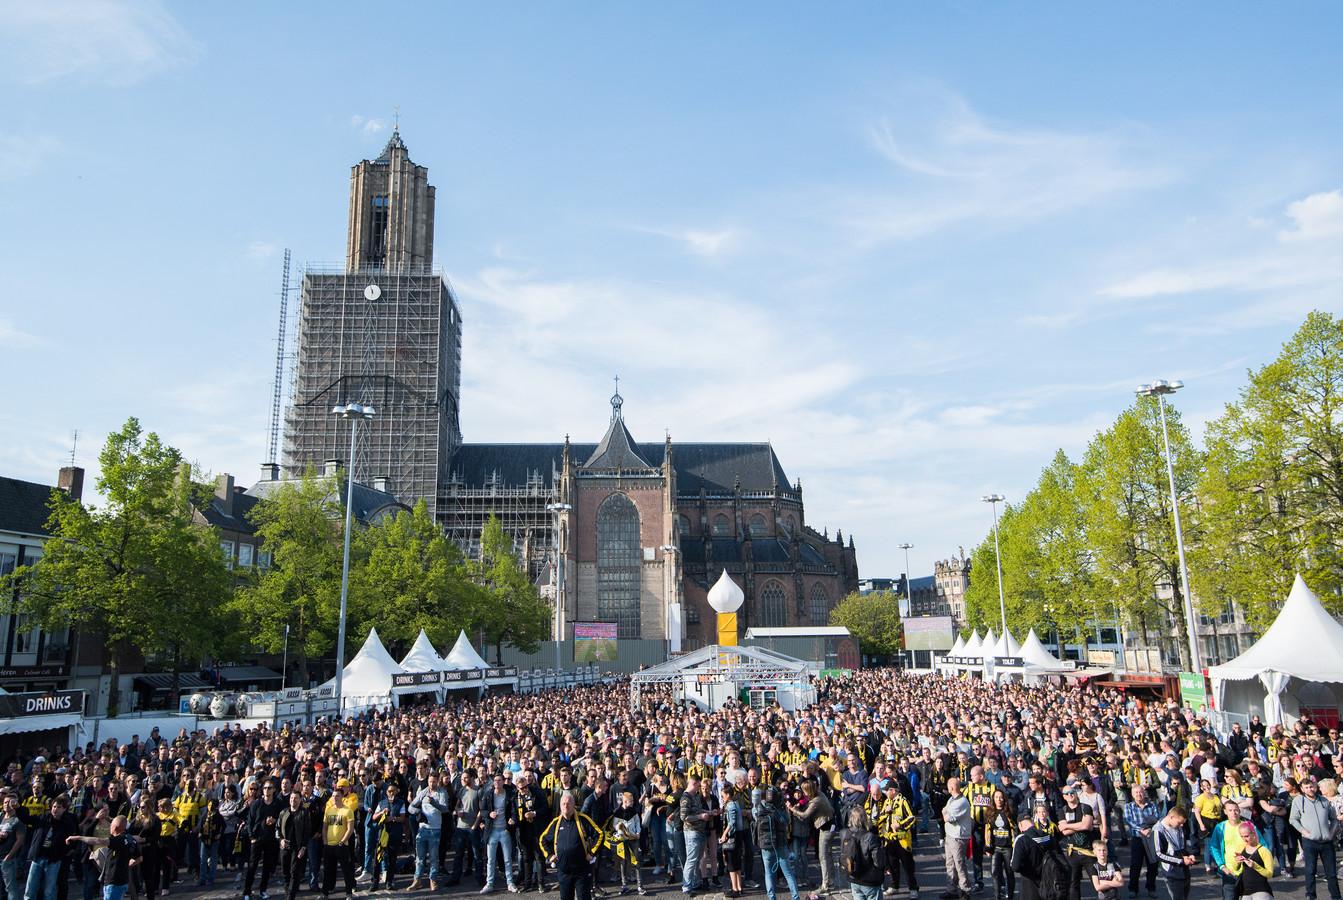 Bekerfinale rustig verlopen in arnhem feestvreugde overheerst foto - Foto van het terras ...